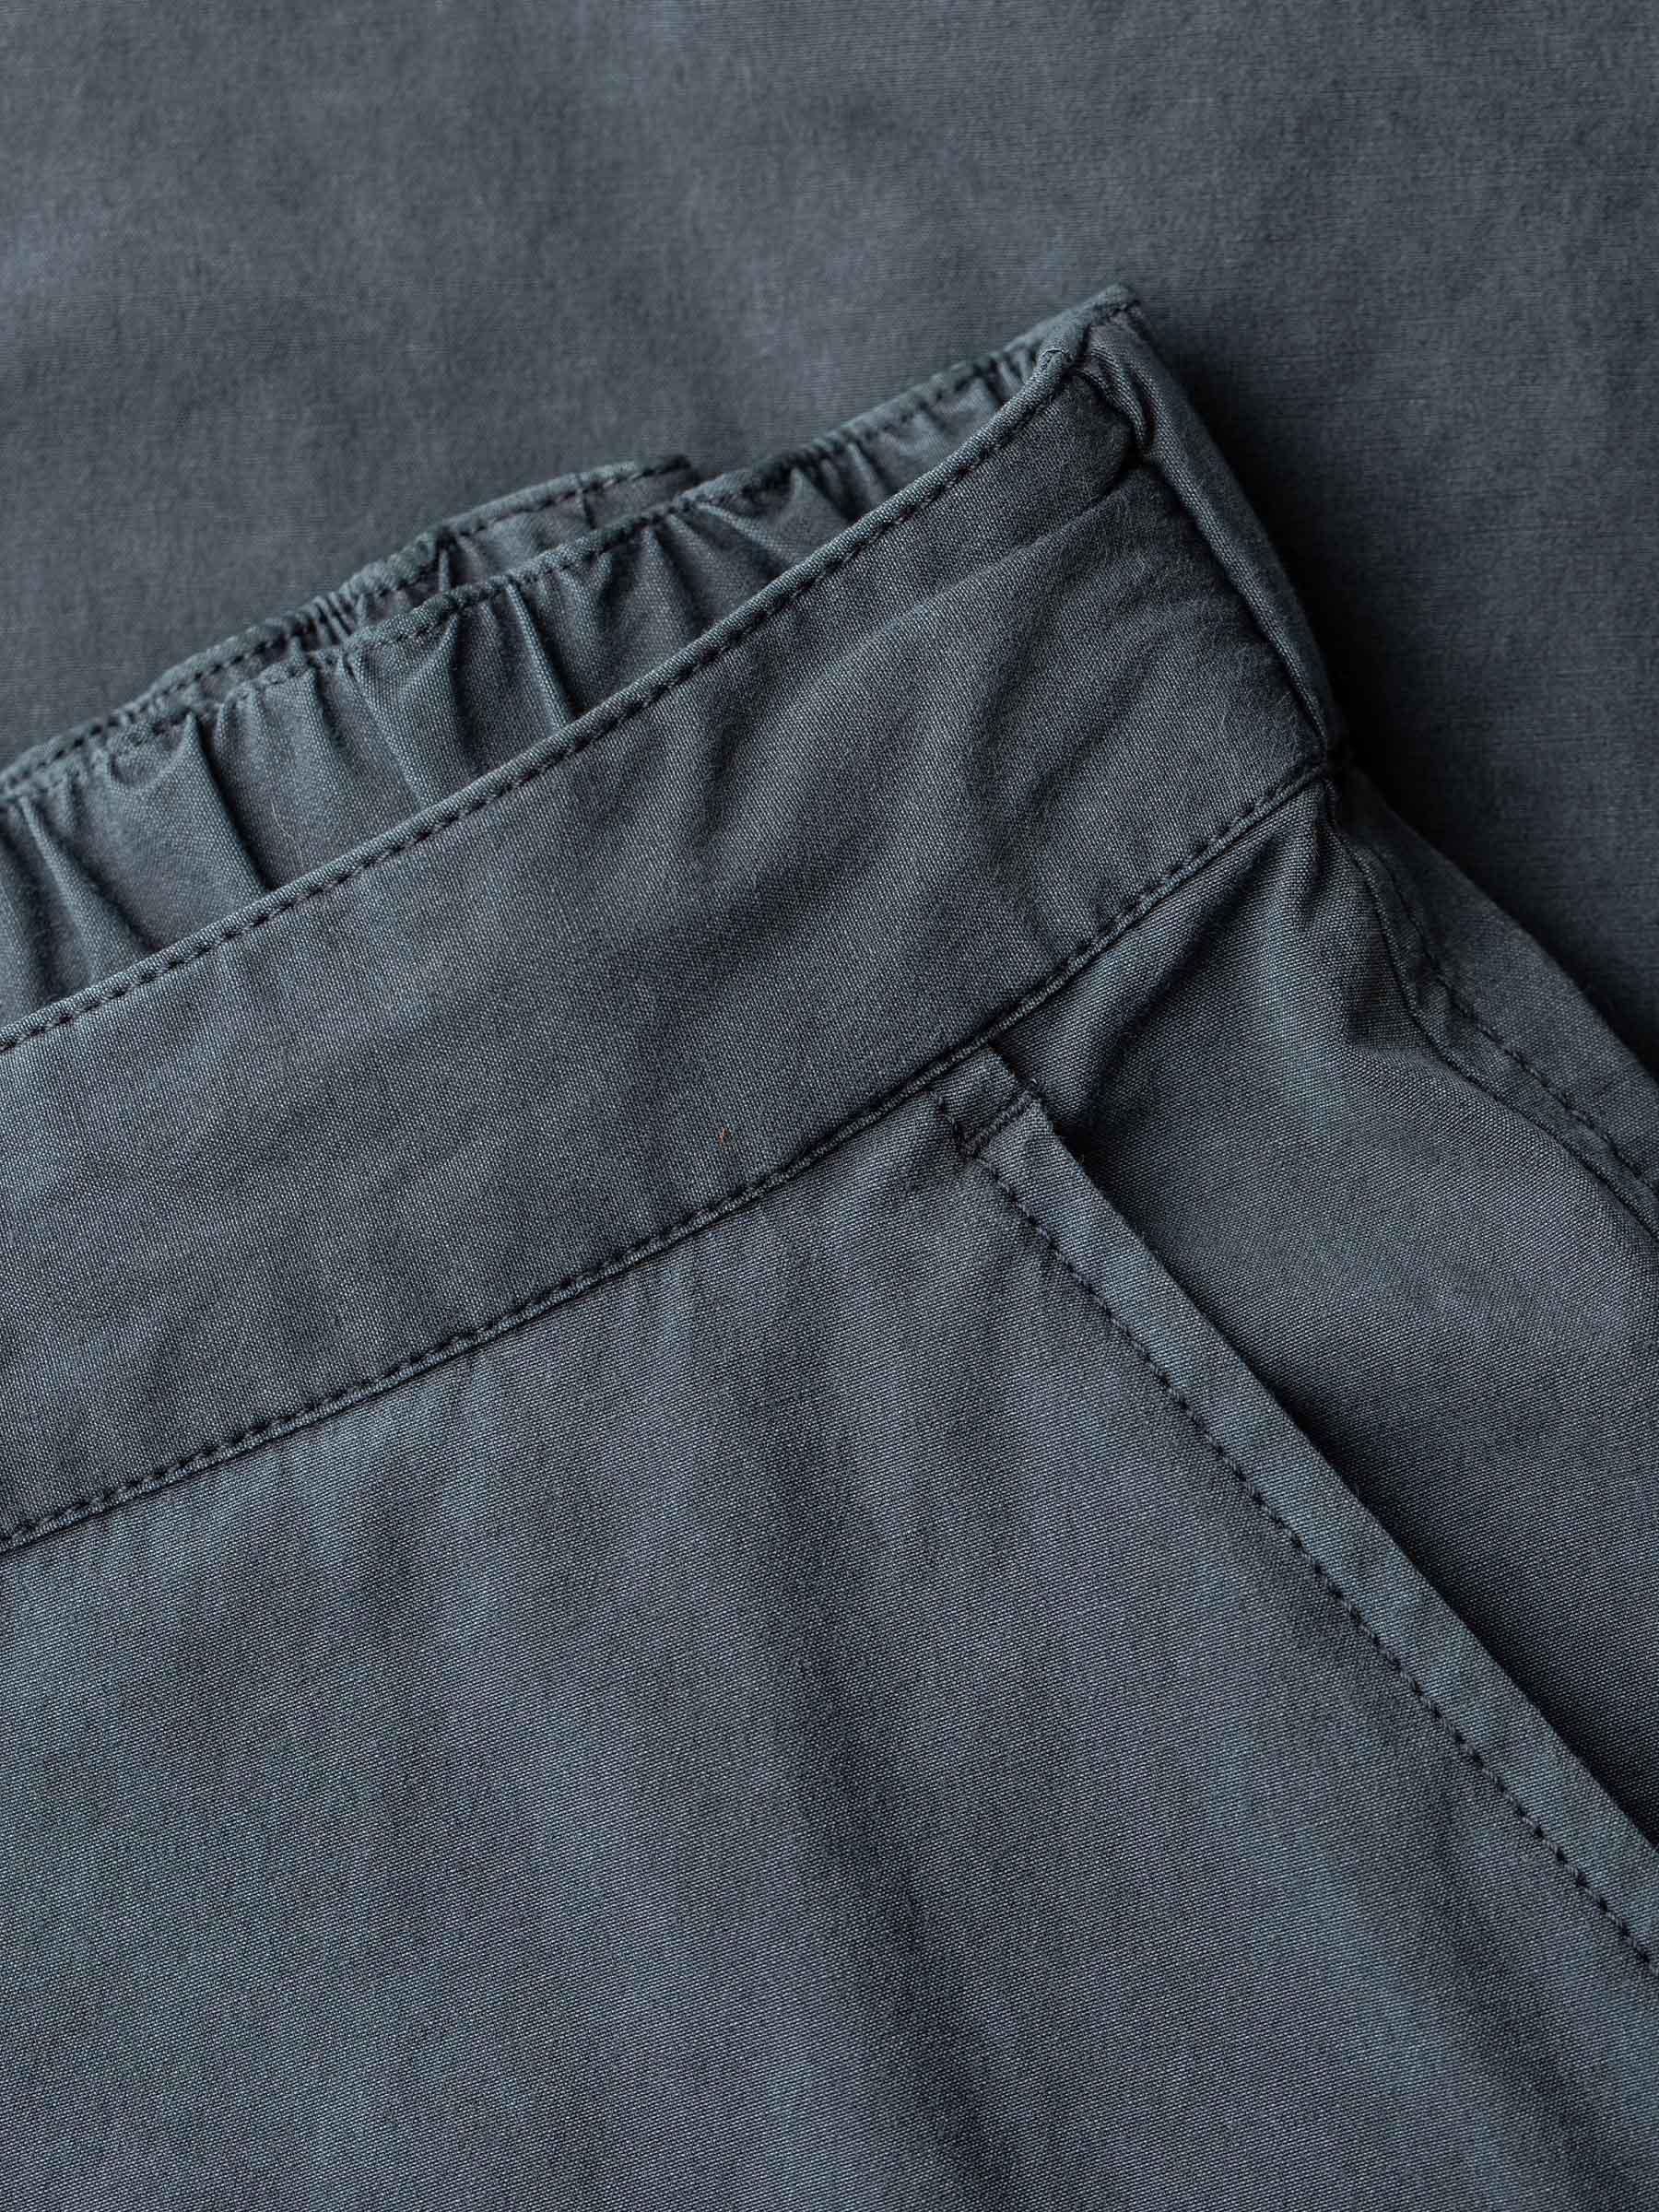 Buck Mason - Vintage Shale Deck Short